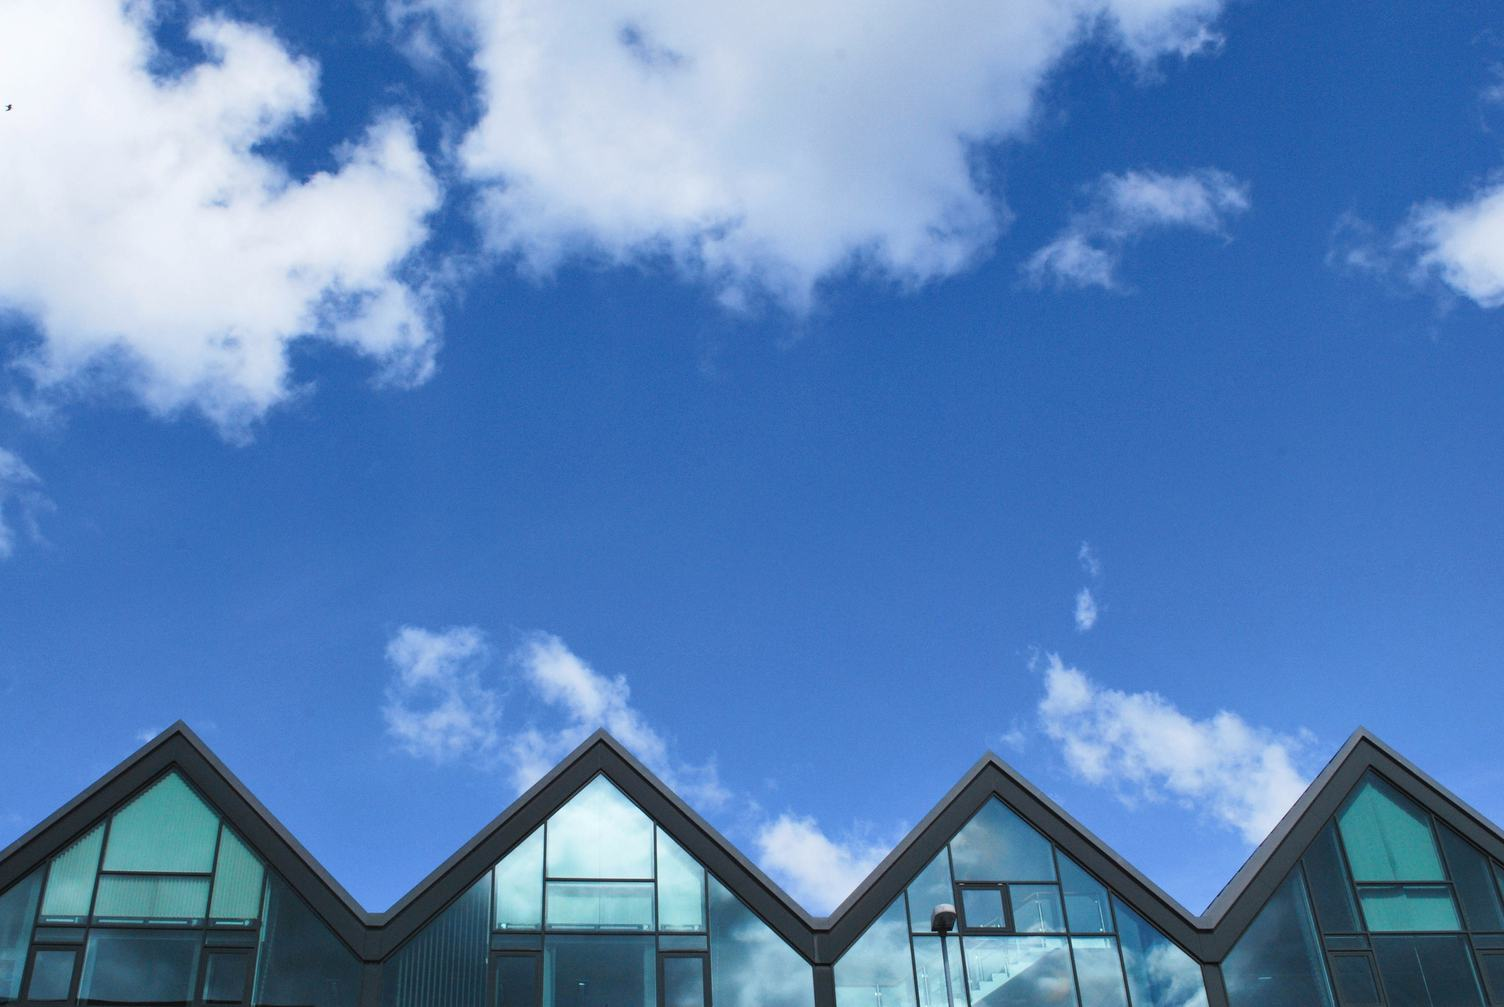 Glass Buildings against Blue Sky